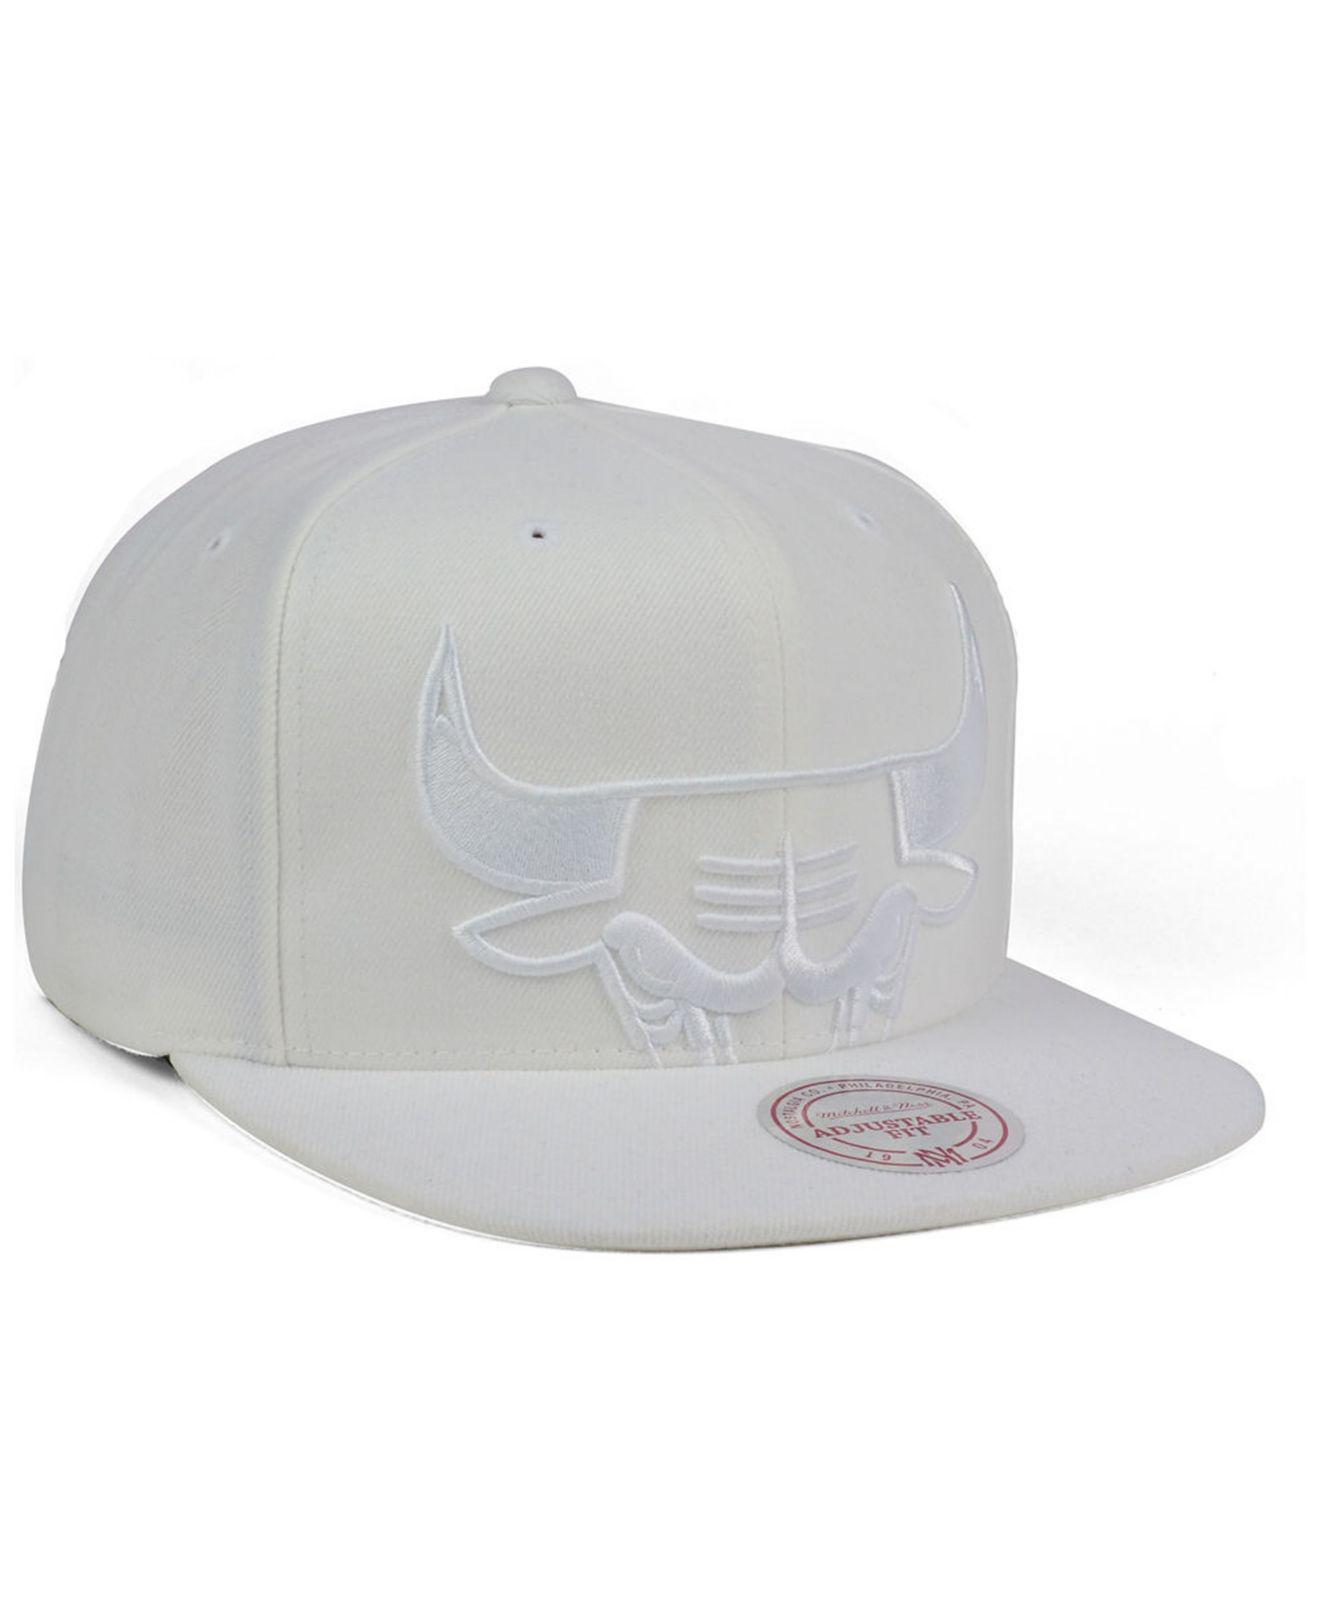 b23114b87ba ... australia mitchell ness white chicago bulls cropped xl logo snapback  cap for men lyst. view